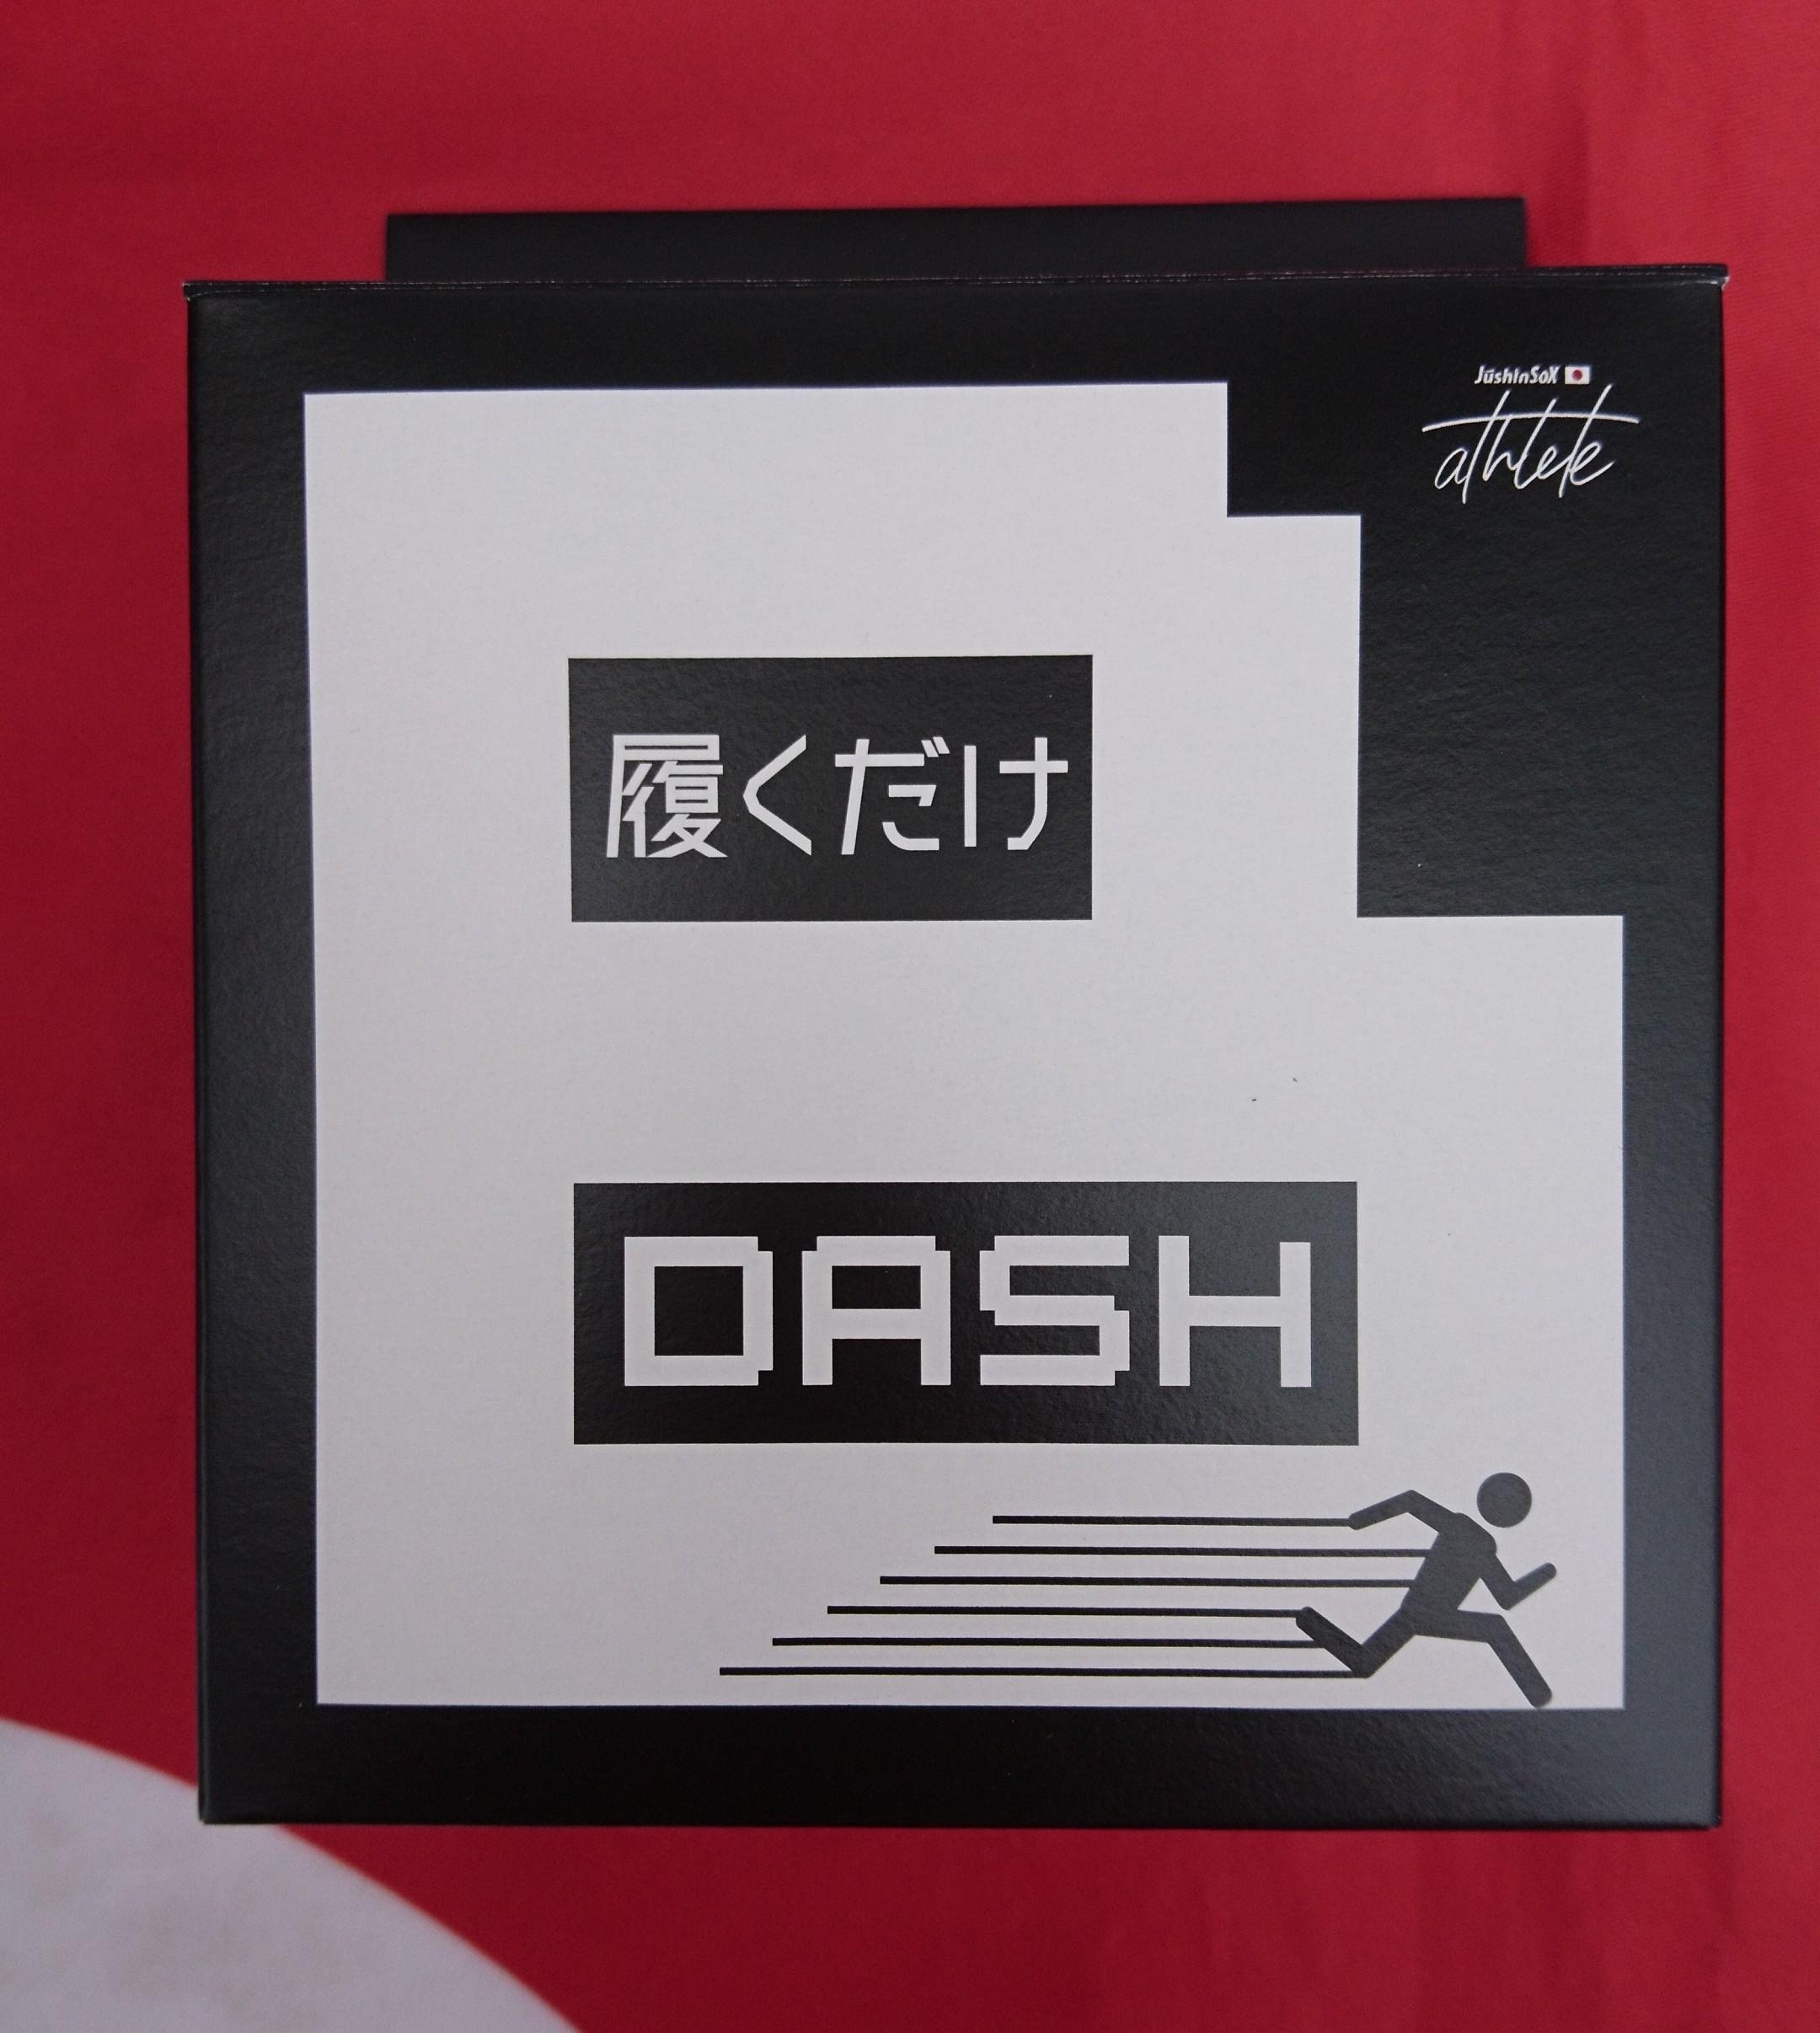 Palourde JusinSOX BDASH 重心ソックス BDASH 5本指ソックス アスリート向け